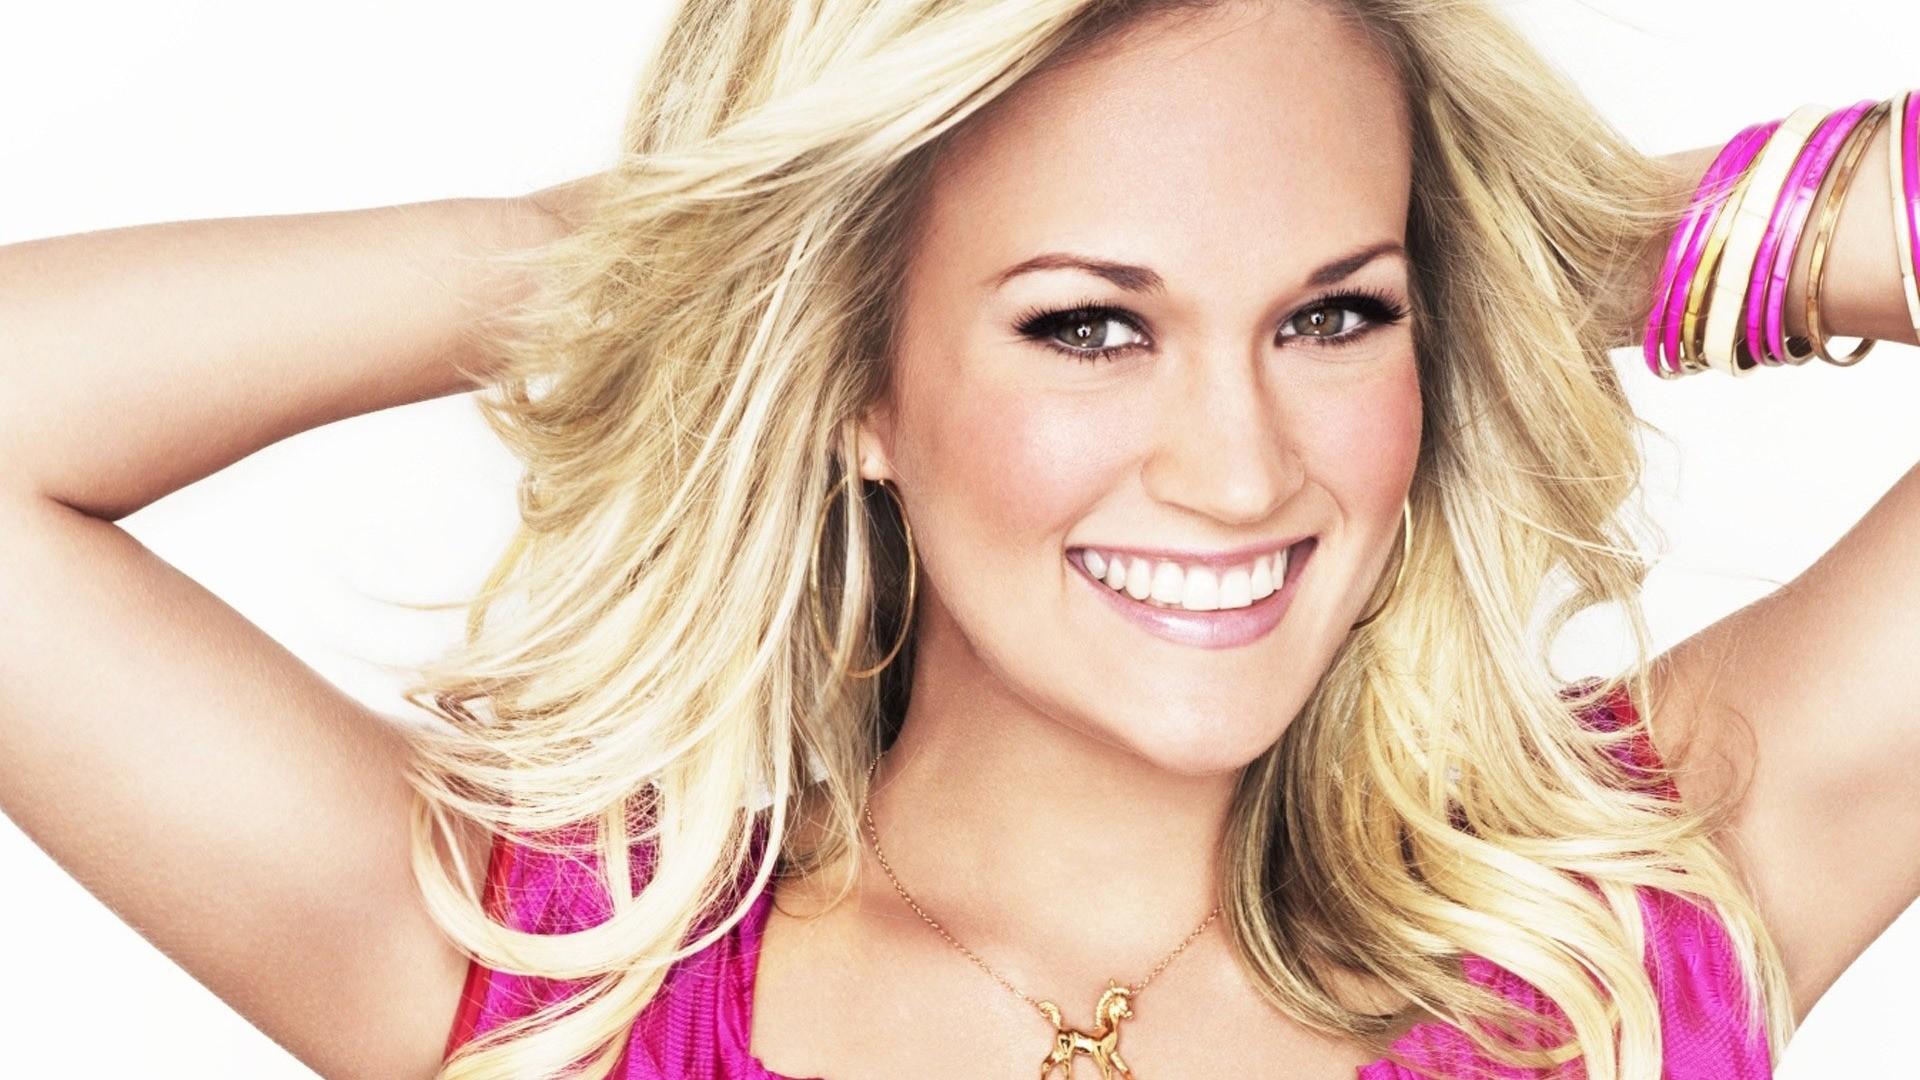 Carrie Underwood Full HD Wallpaper